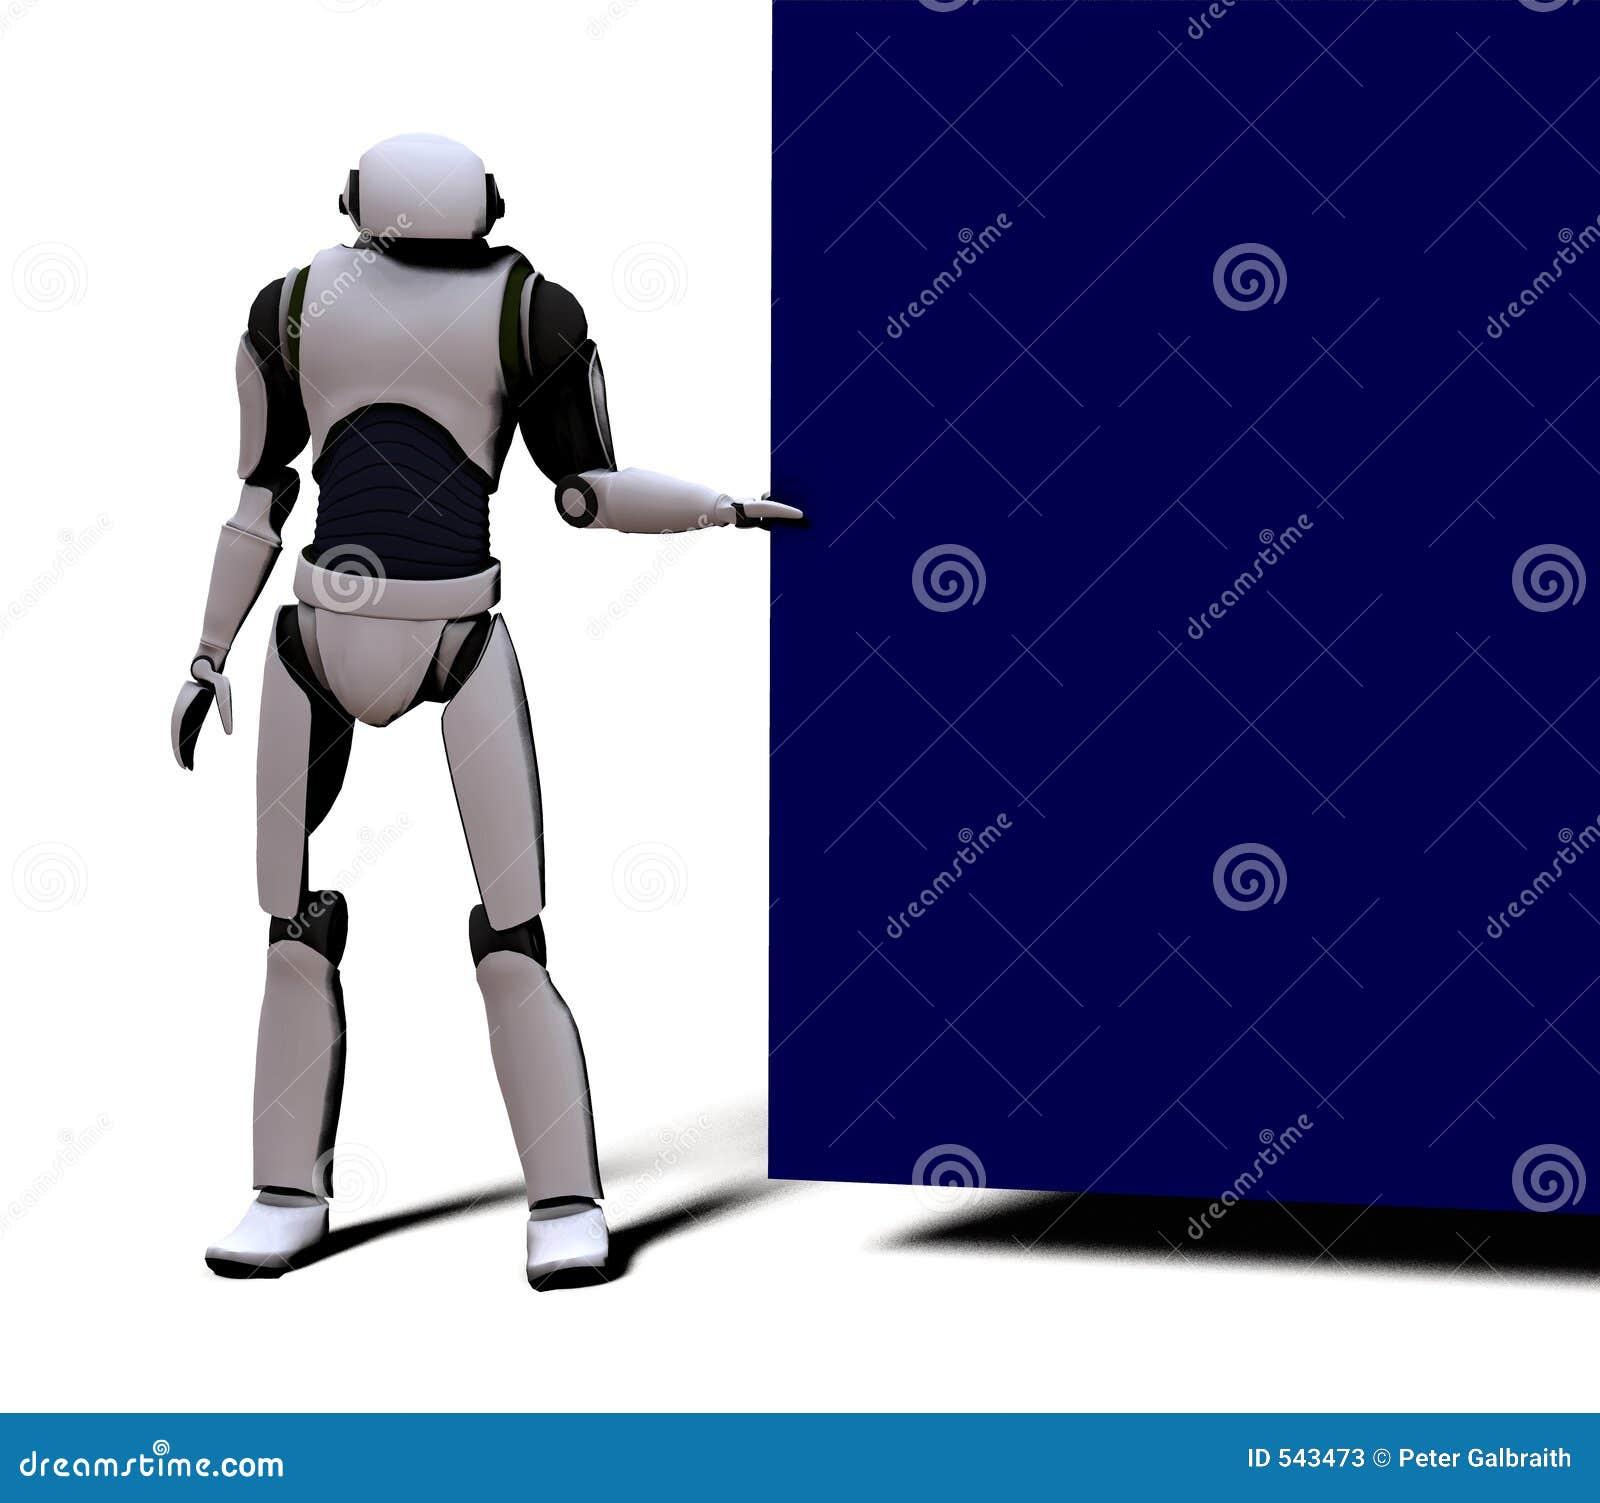 Download 机器人符号w 库存例证. 插画 包括有 电路, 回报, 远期, 外面, 动画片, 符号, 火炮, 发明, 危险 - 543473